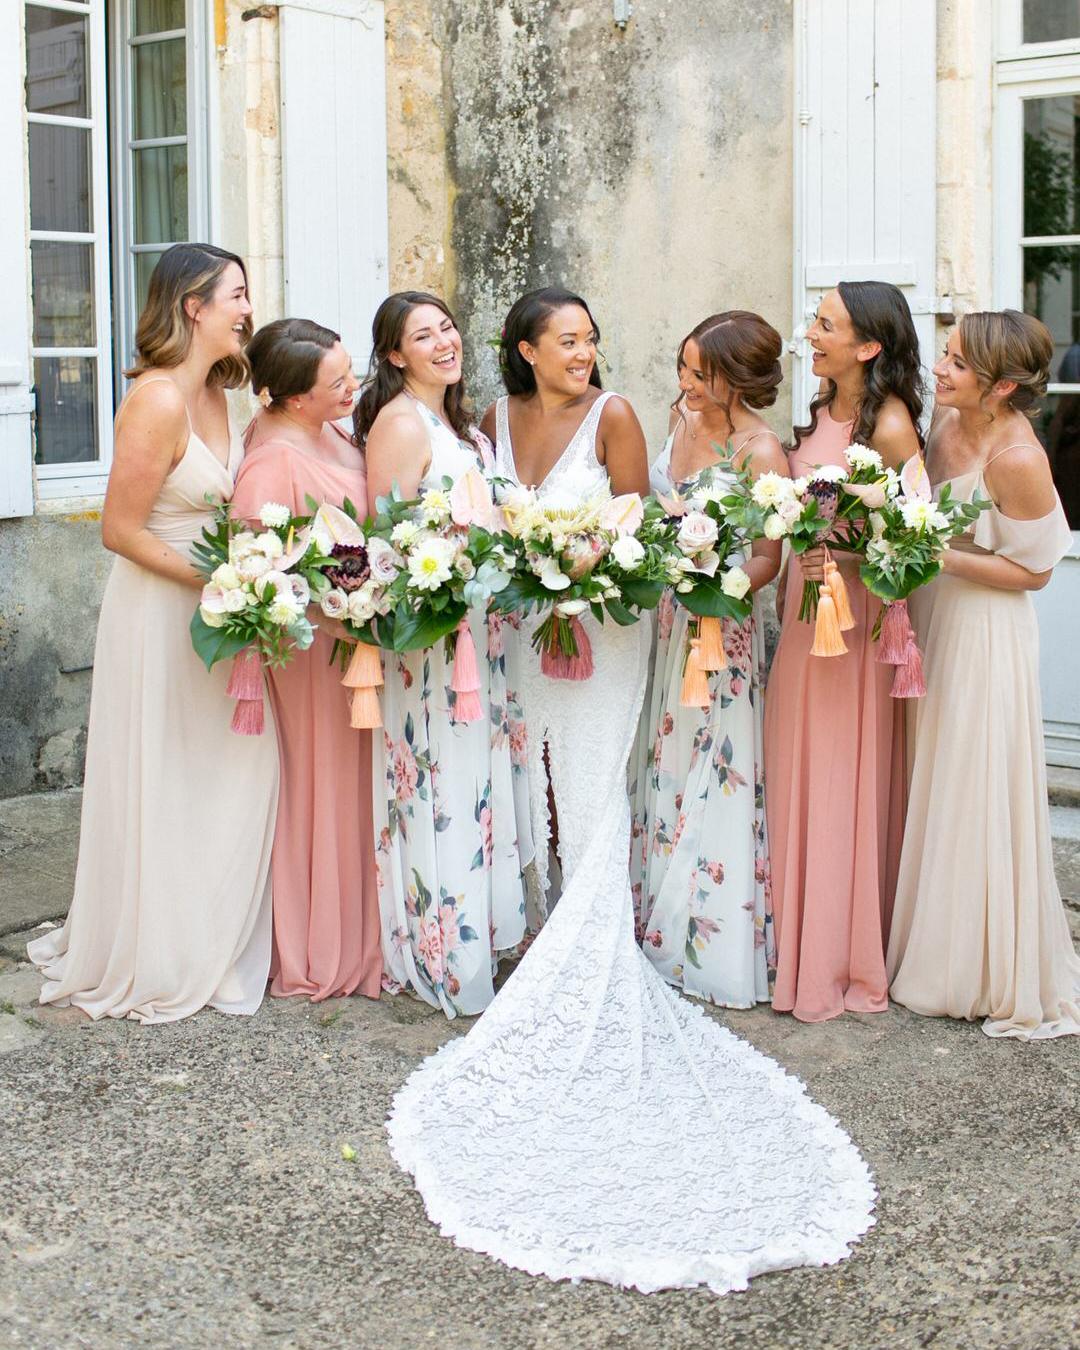 jen tim wedding bridesmaids in pink beige and pastel blue